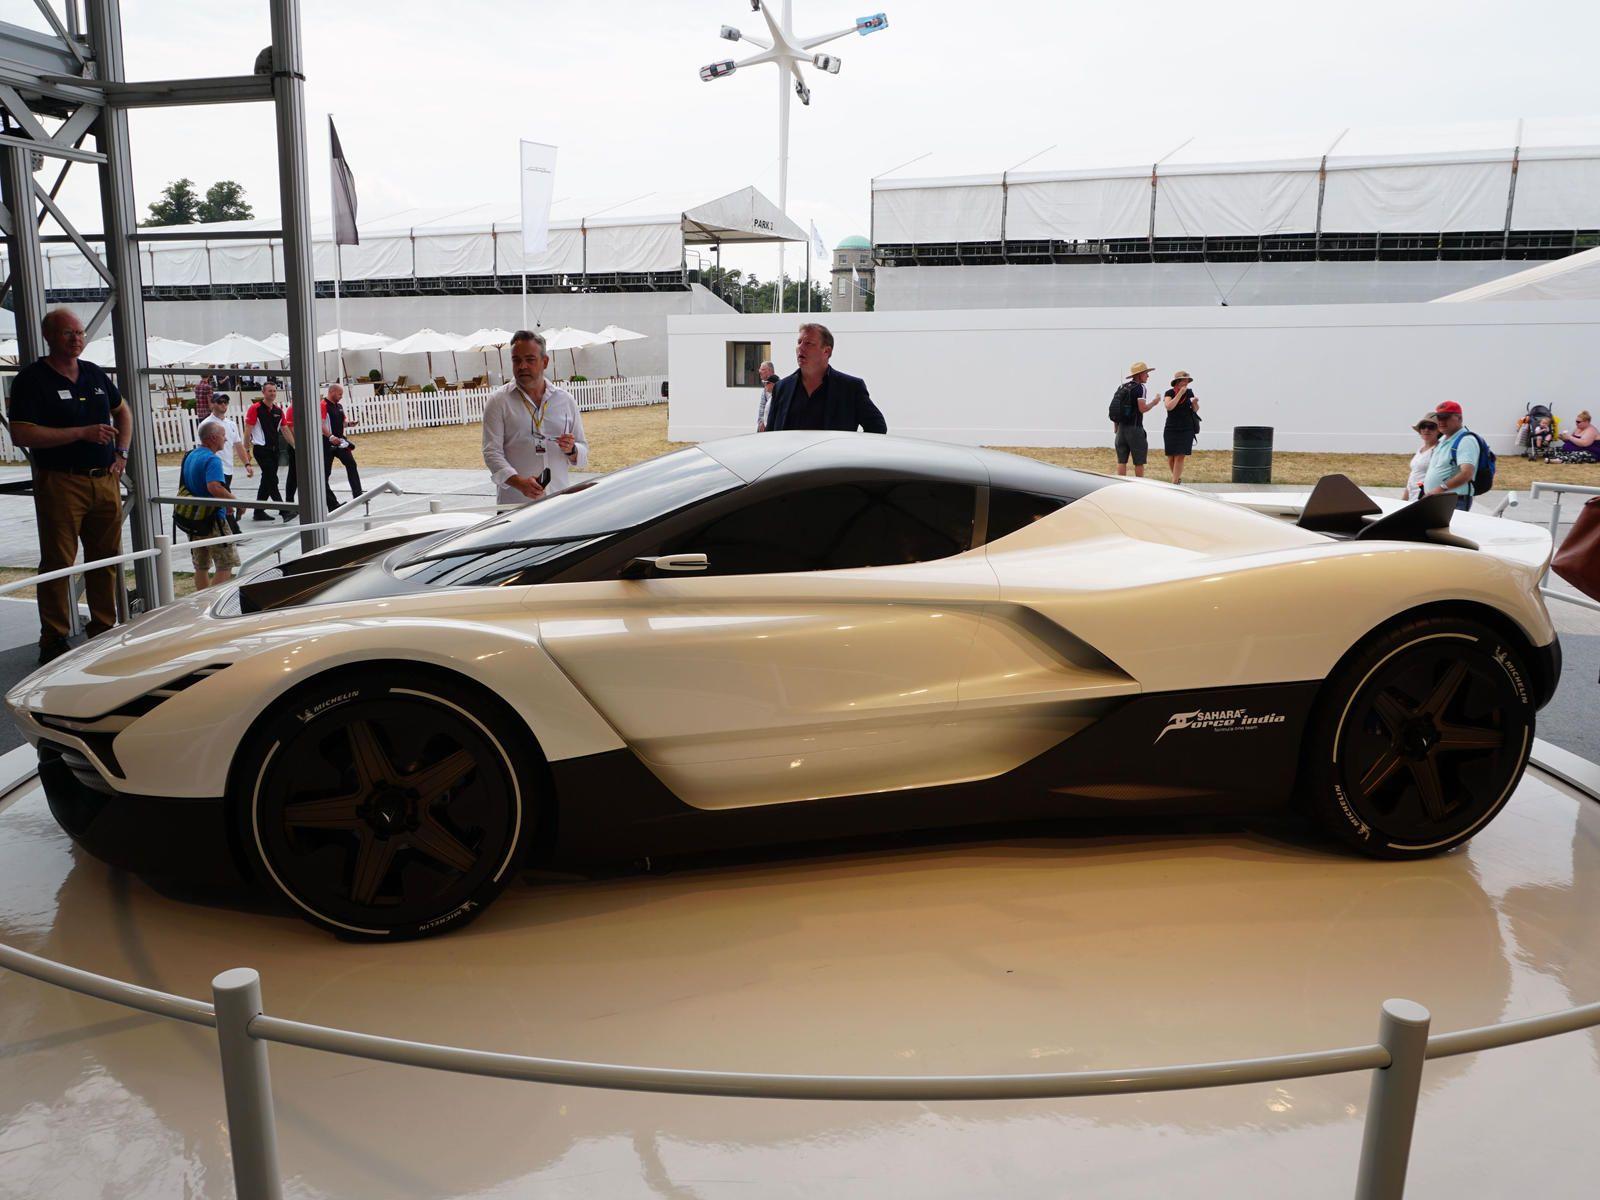 India S First Supercar Mumbai Based Vazirani Automotive Shul Concept Revealed At Goodwood With Jet Turbine Power Carbuzz Jet Turbine Super Cars Goodwood